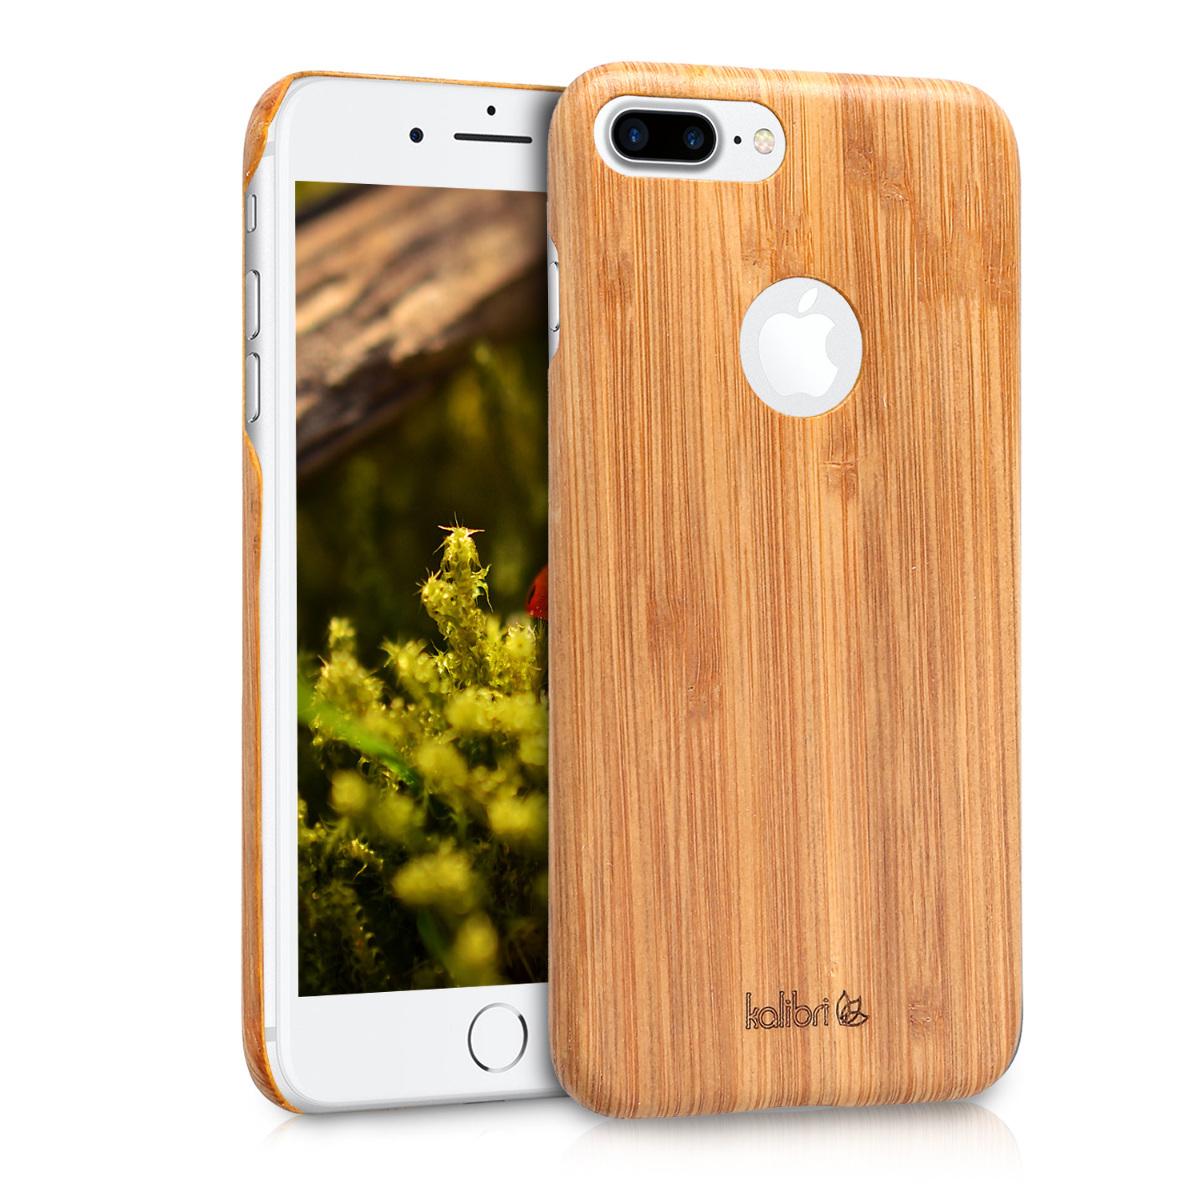 Kalibri Σκληρή Ξύλινη θήκη iPhone 7 Plus / 8 Plus  - Ultra Slim (39717.24)